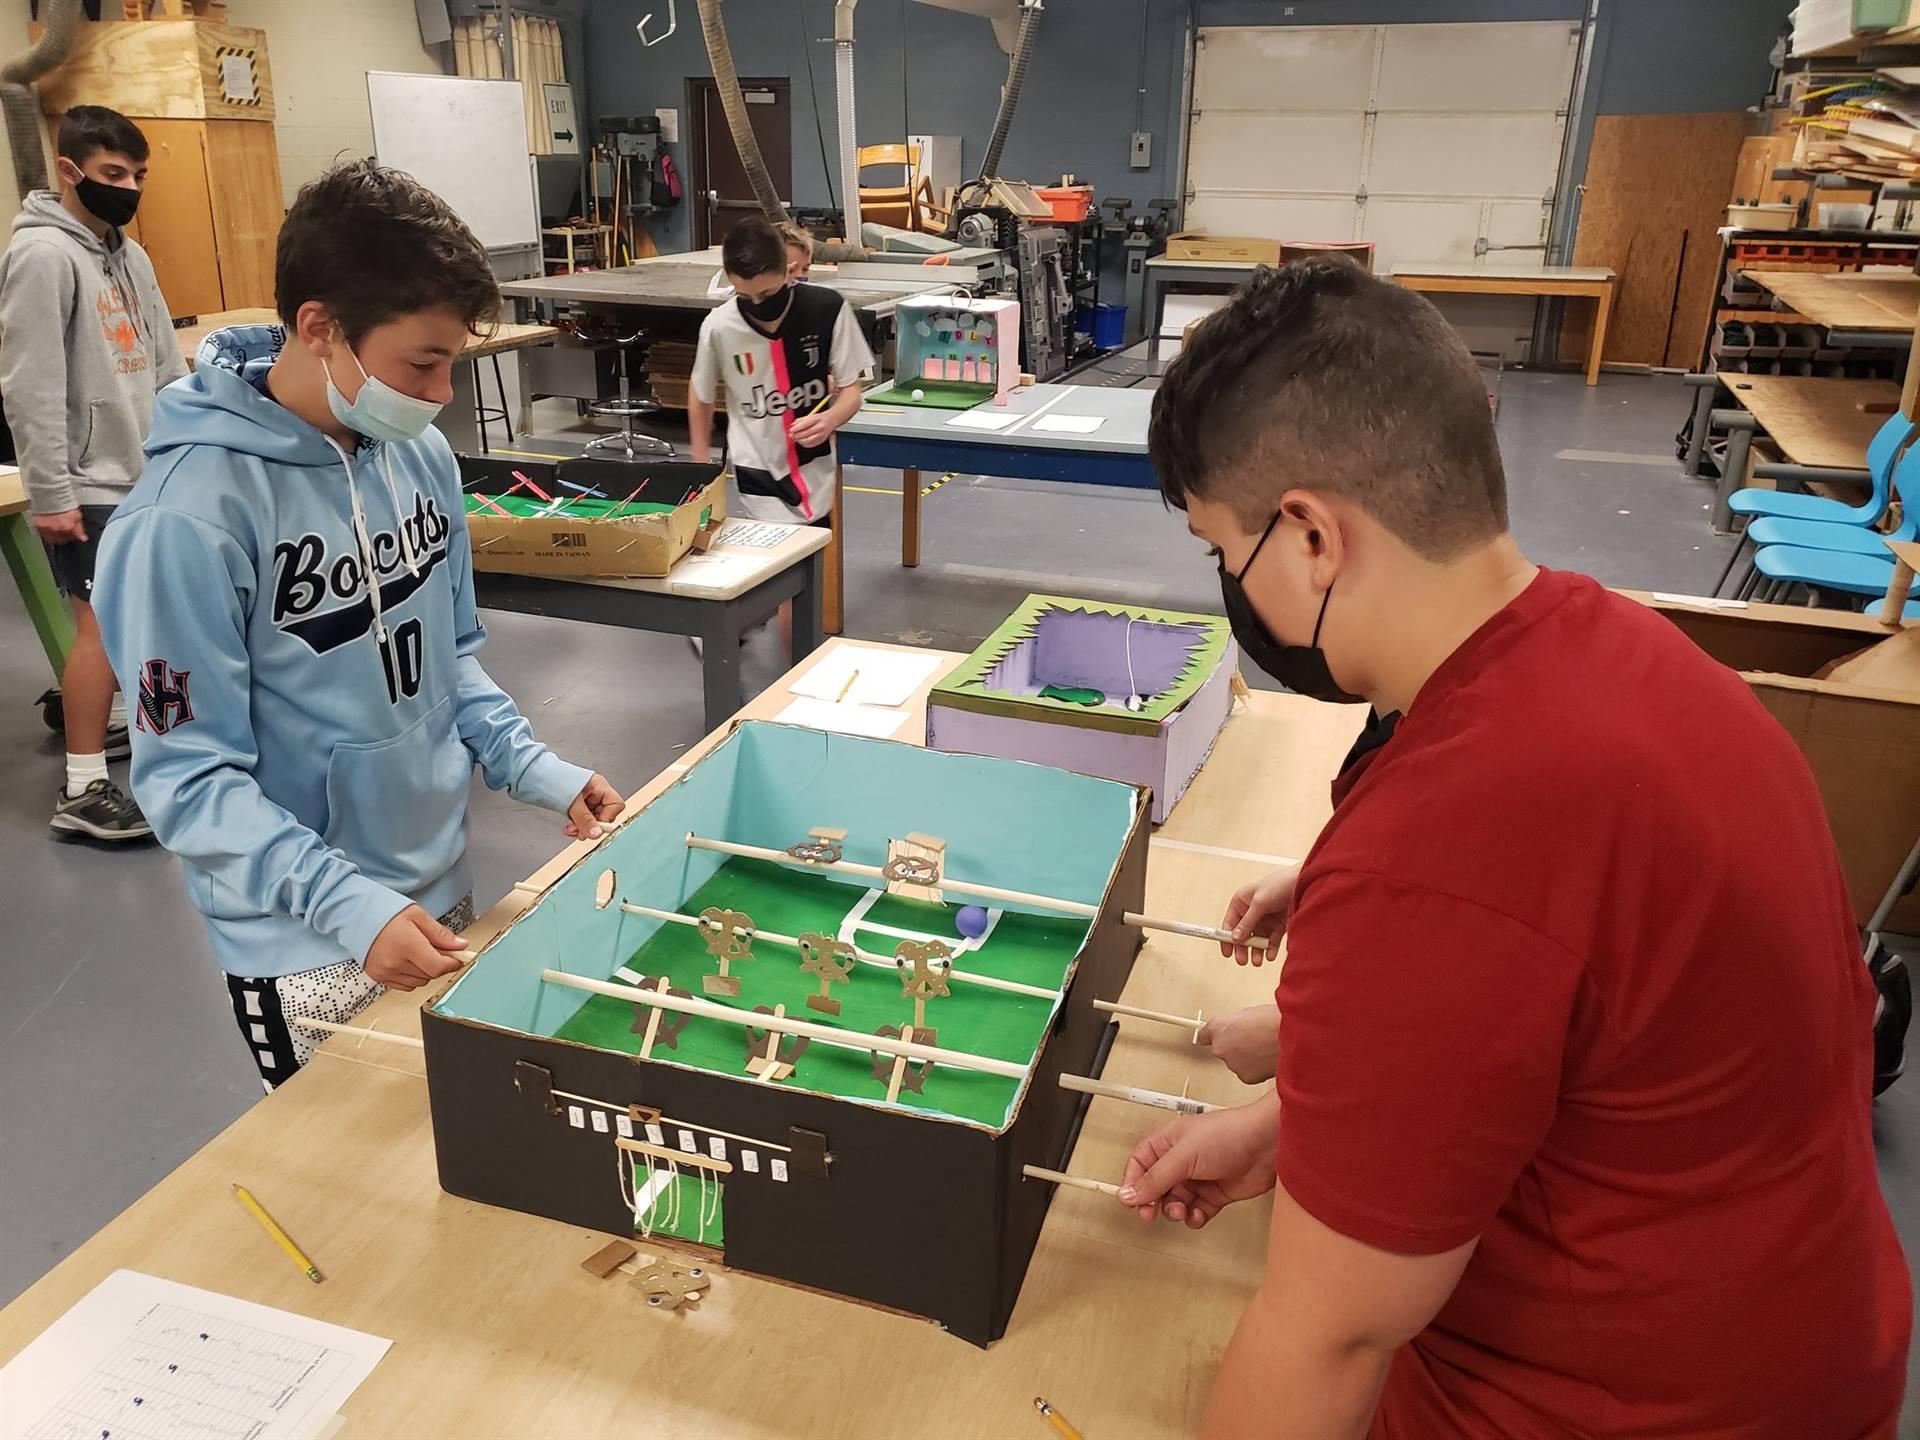 Cardboard arcade in Tech Ed/STEAM class